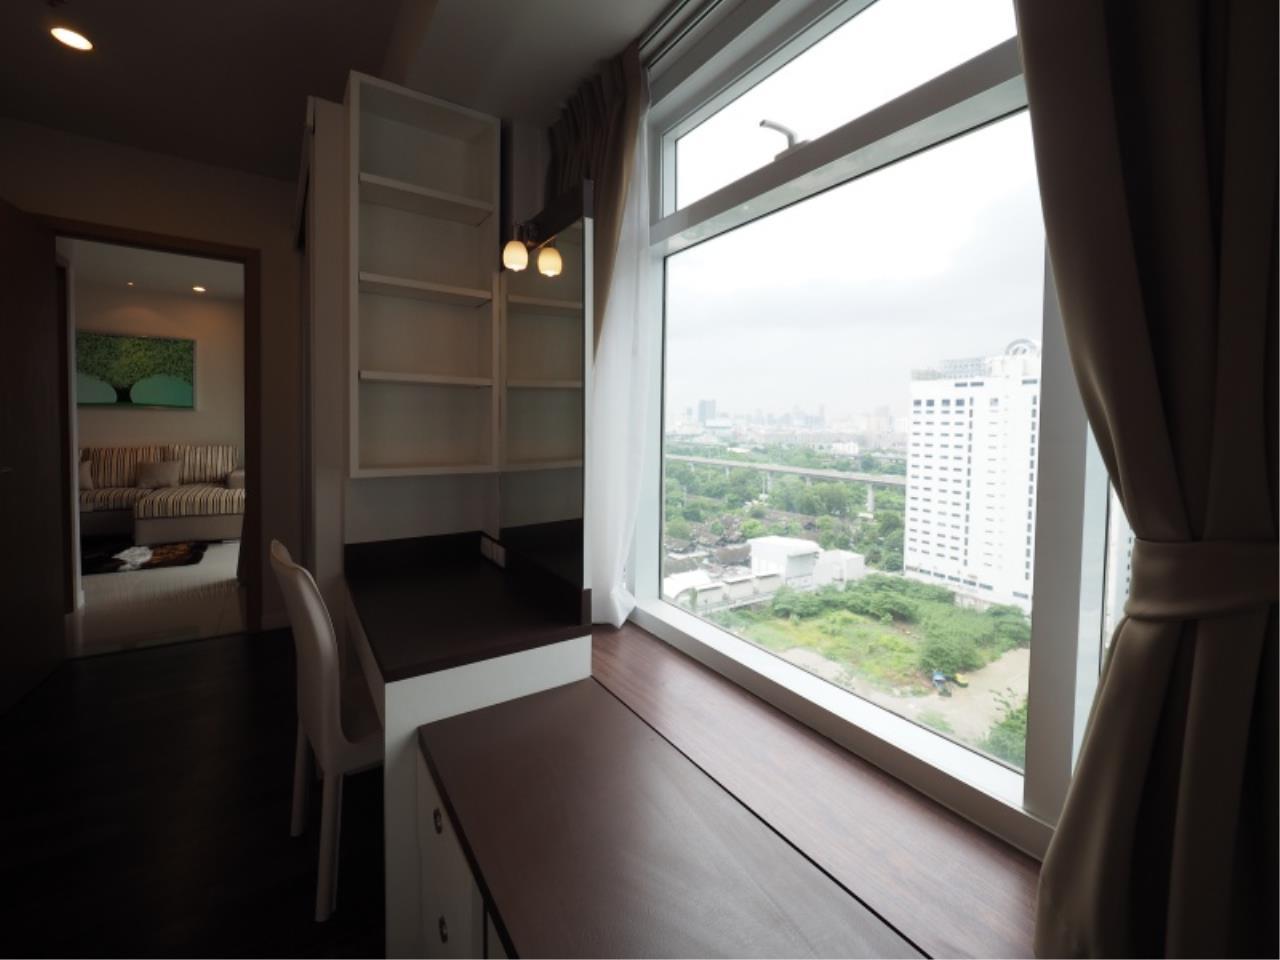 Century21 Skylux Agency's Circle Condominium / Condo For Rent / 1 Bedroom / 46 SQM / MRT Phetchaburi / Bangkok 6